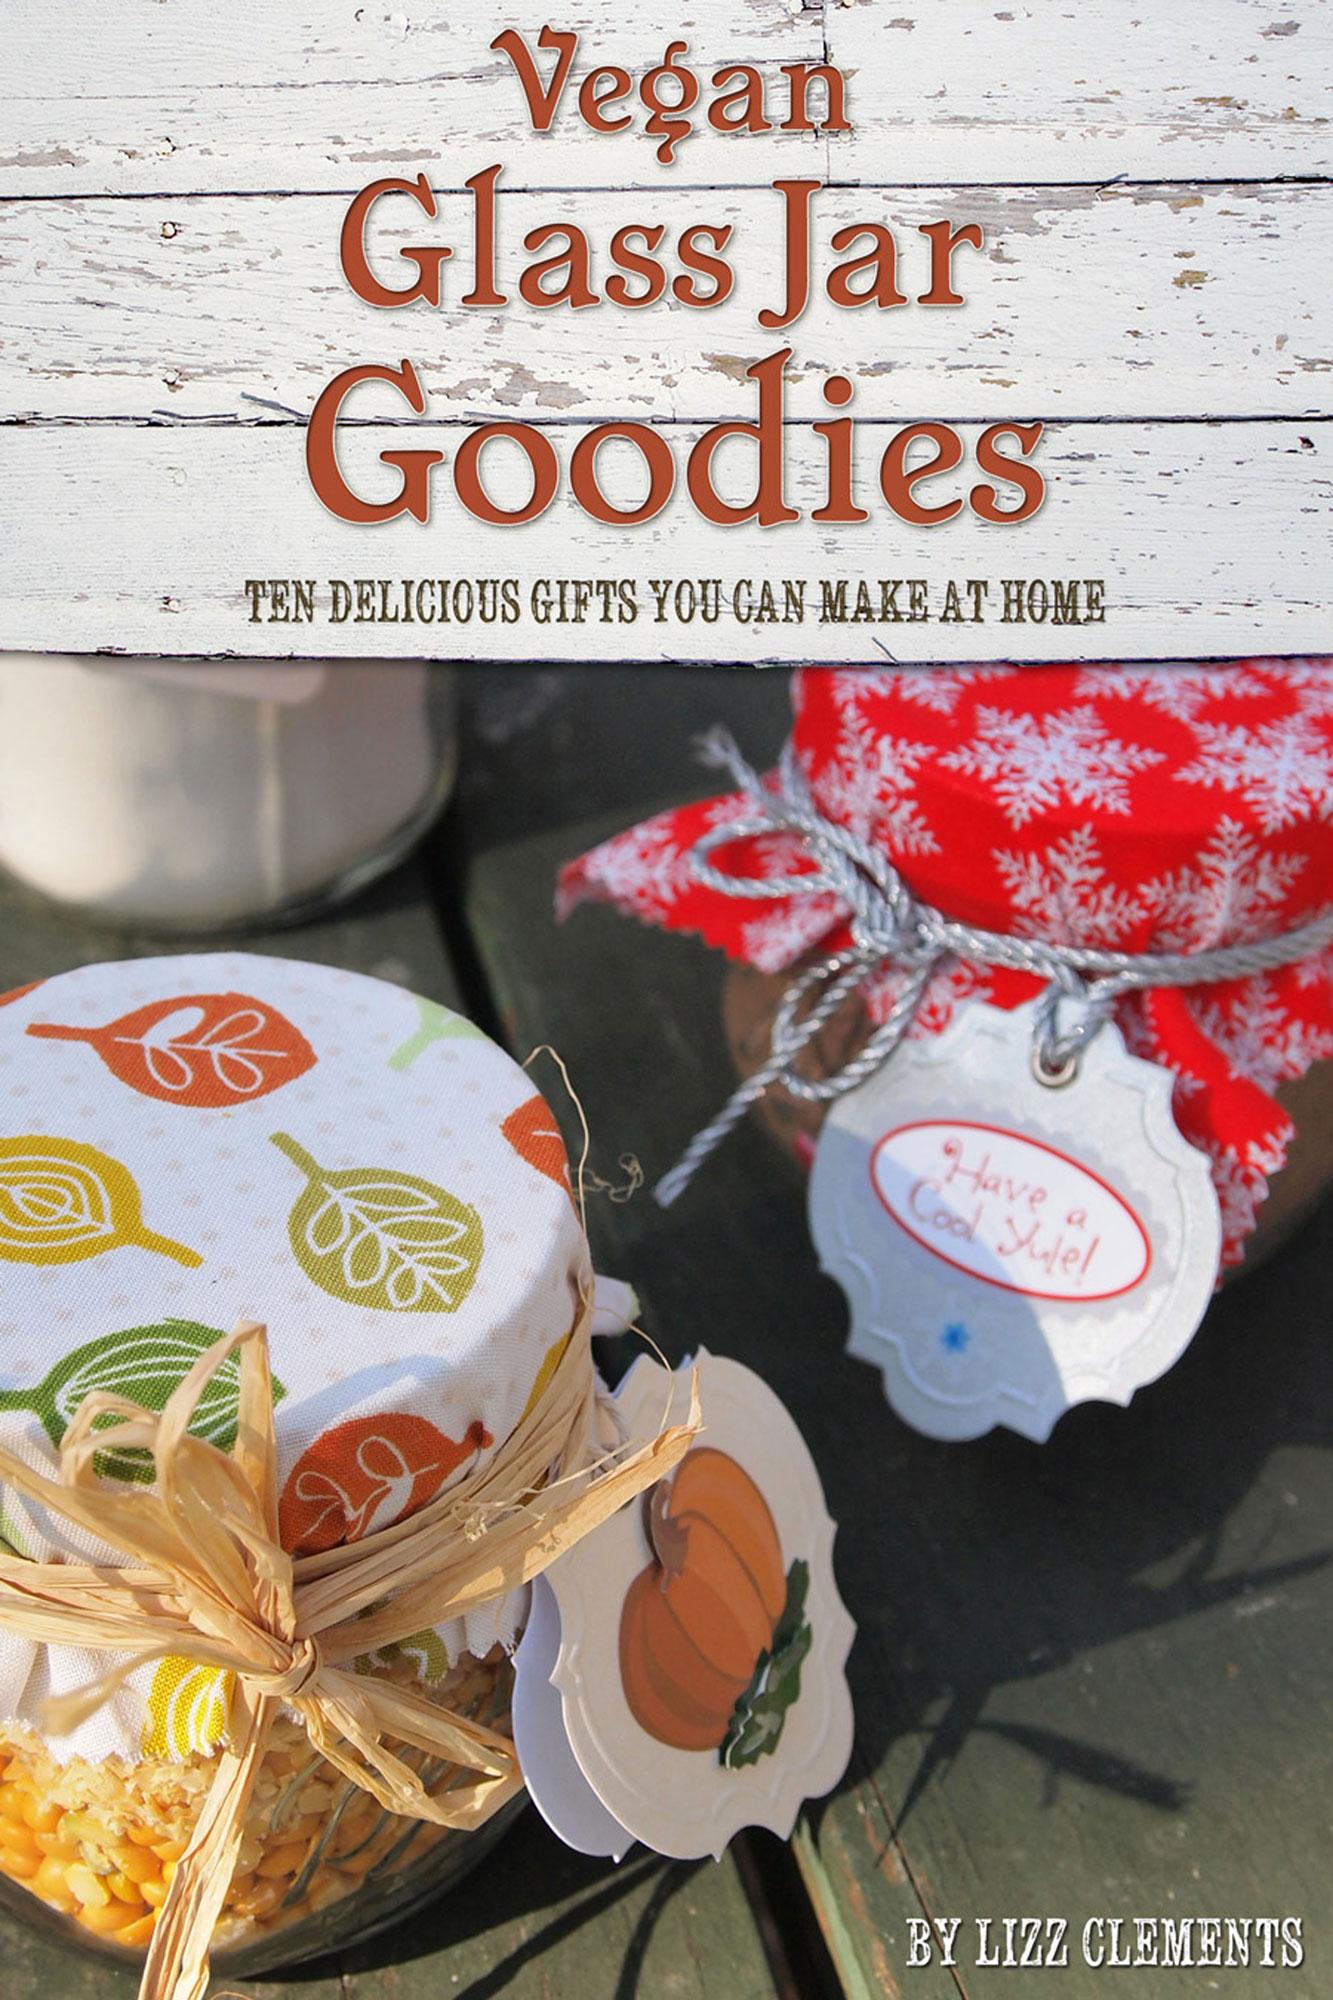 Vegan Glass Jar Goodies